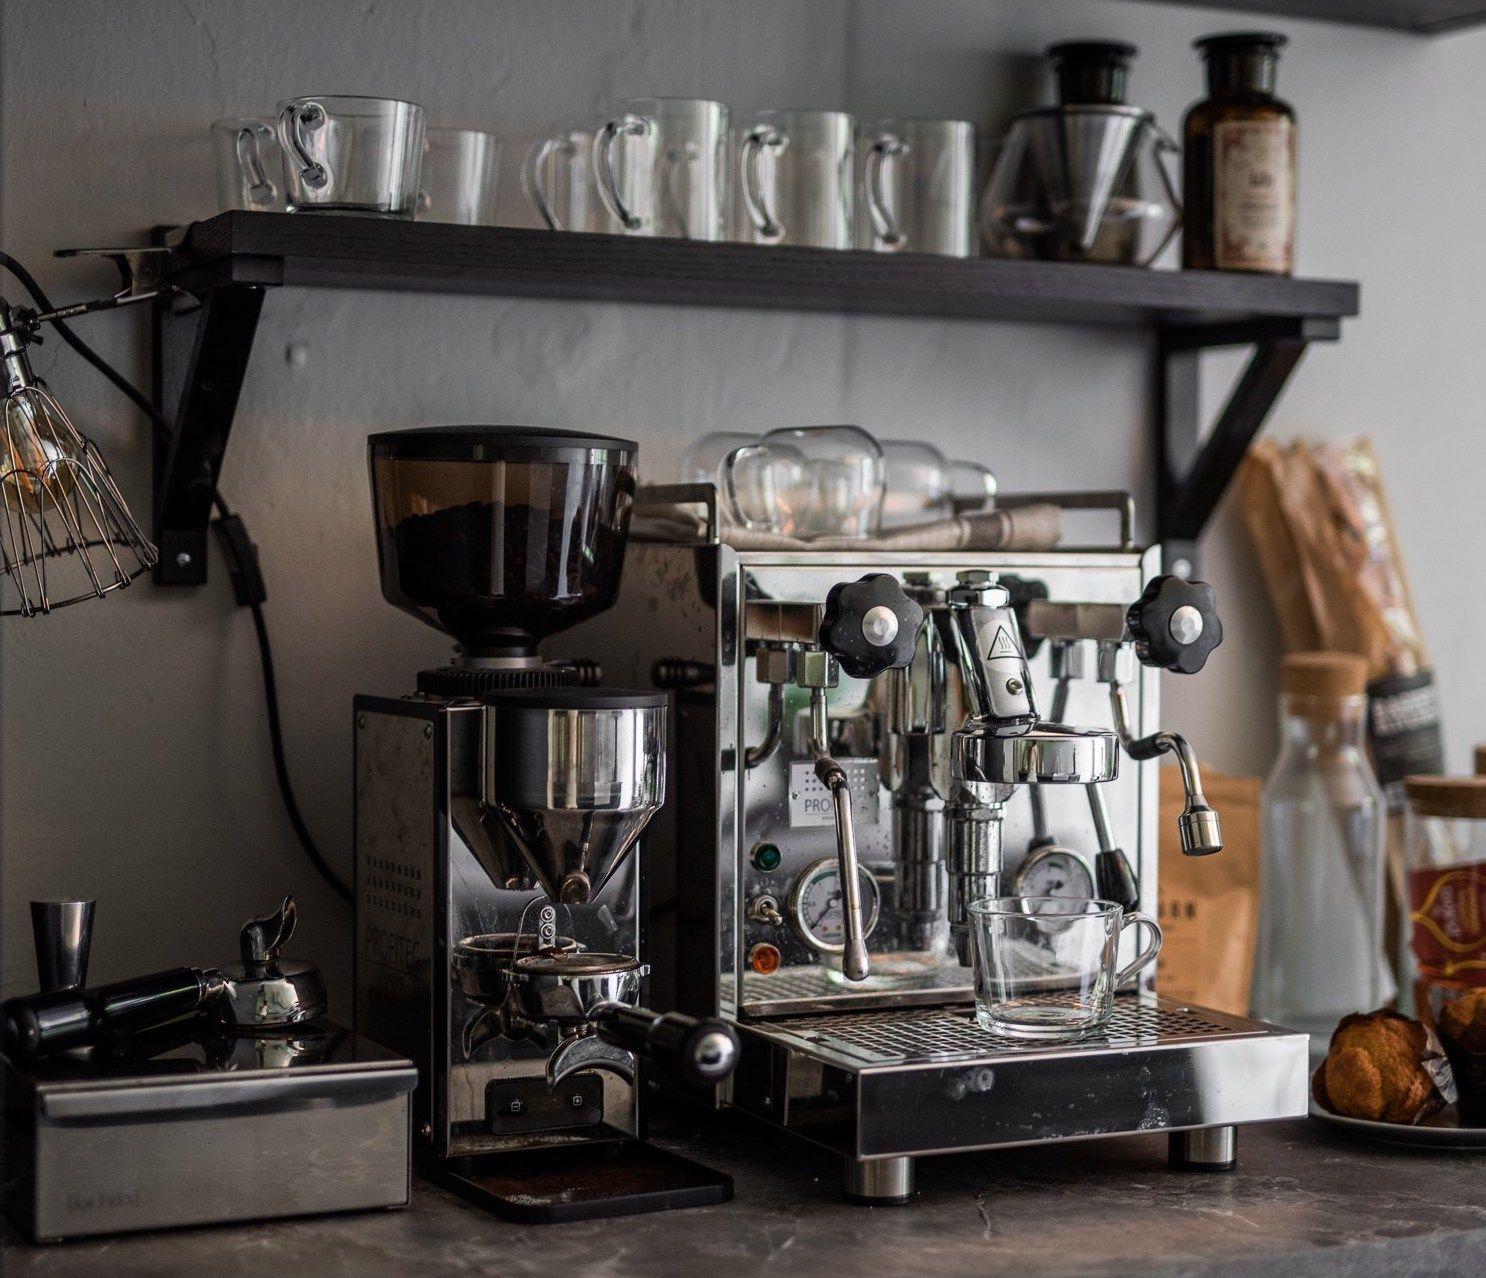 Spacious Kitchen With My Dream Coffee Setup Coco Lapine Design Spacious Kitchens Home Bar Setup Coffee Bar Home